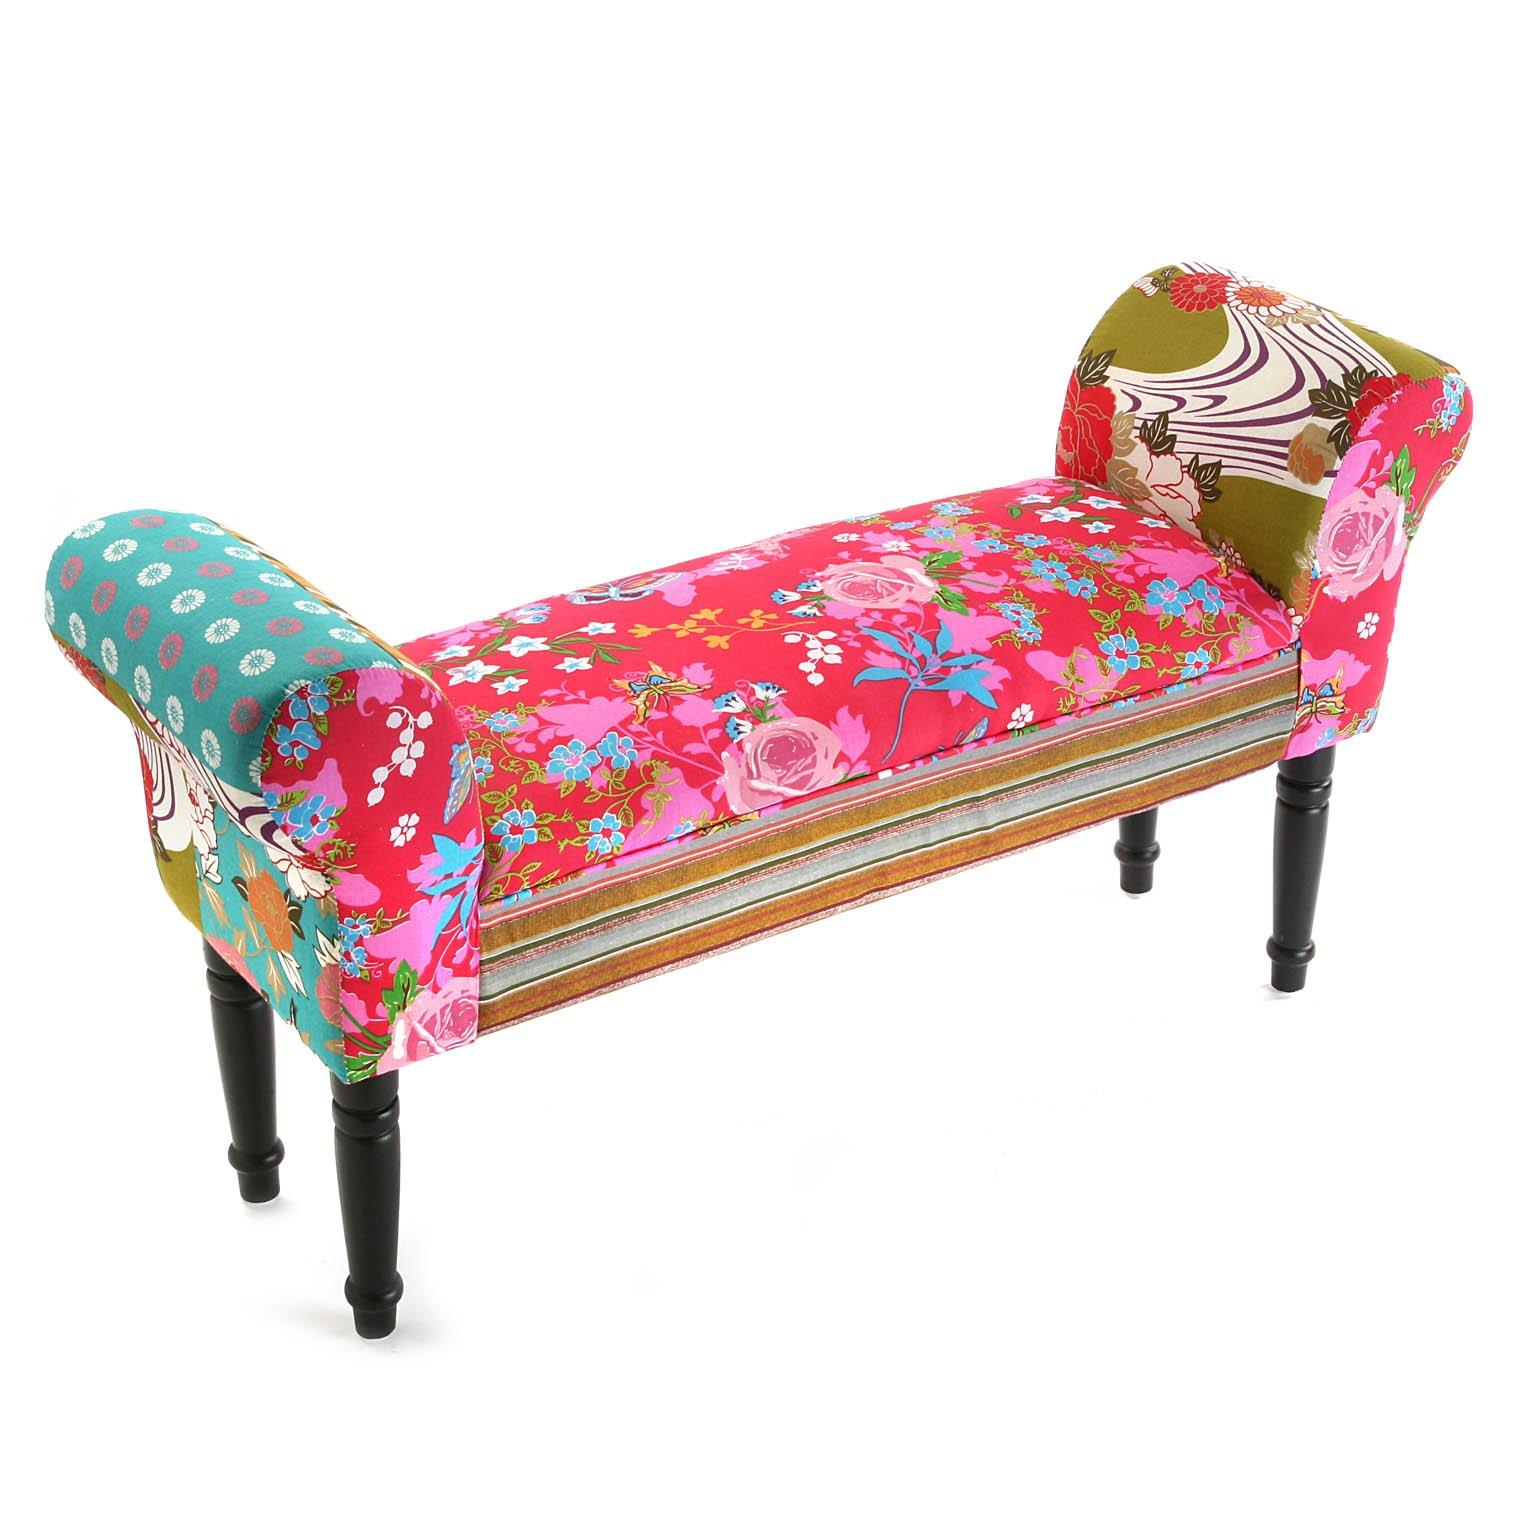 Versa 19500285 Panca da camera da letto Pink Patchwork,53x32x100cm ...